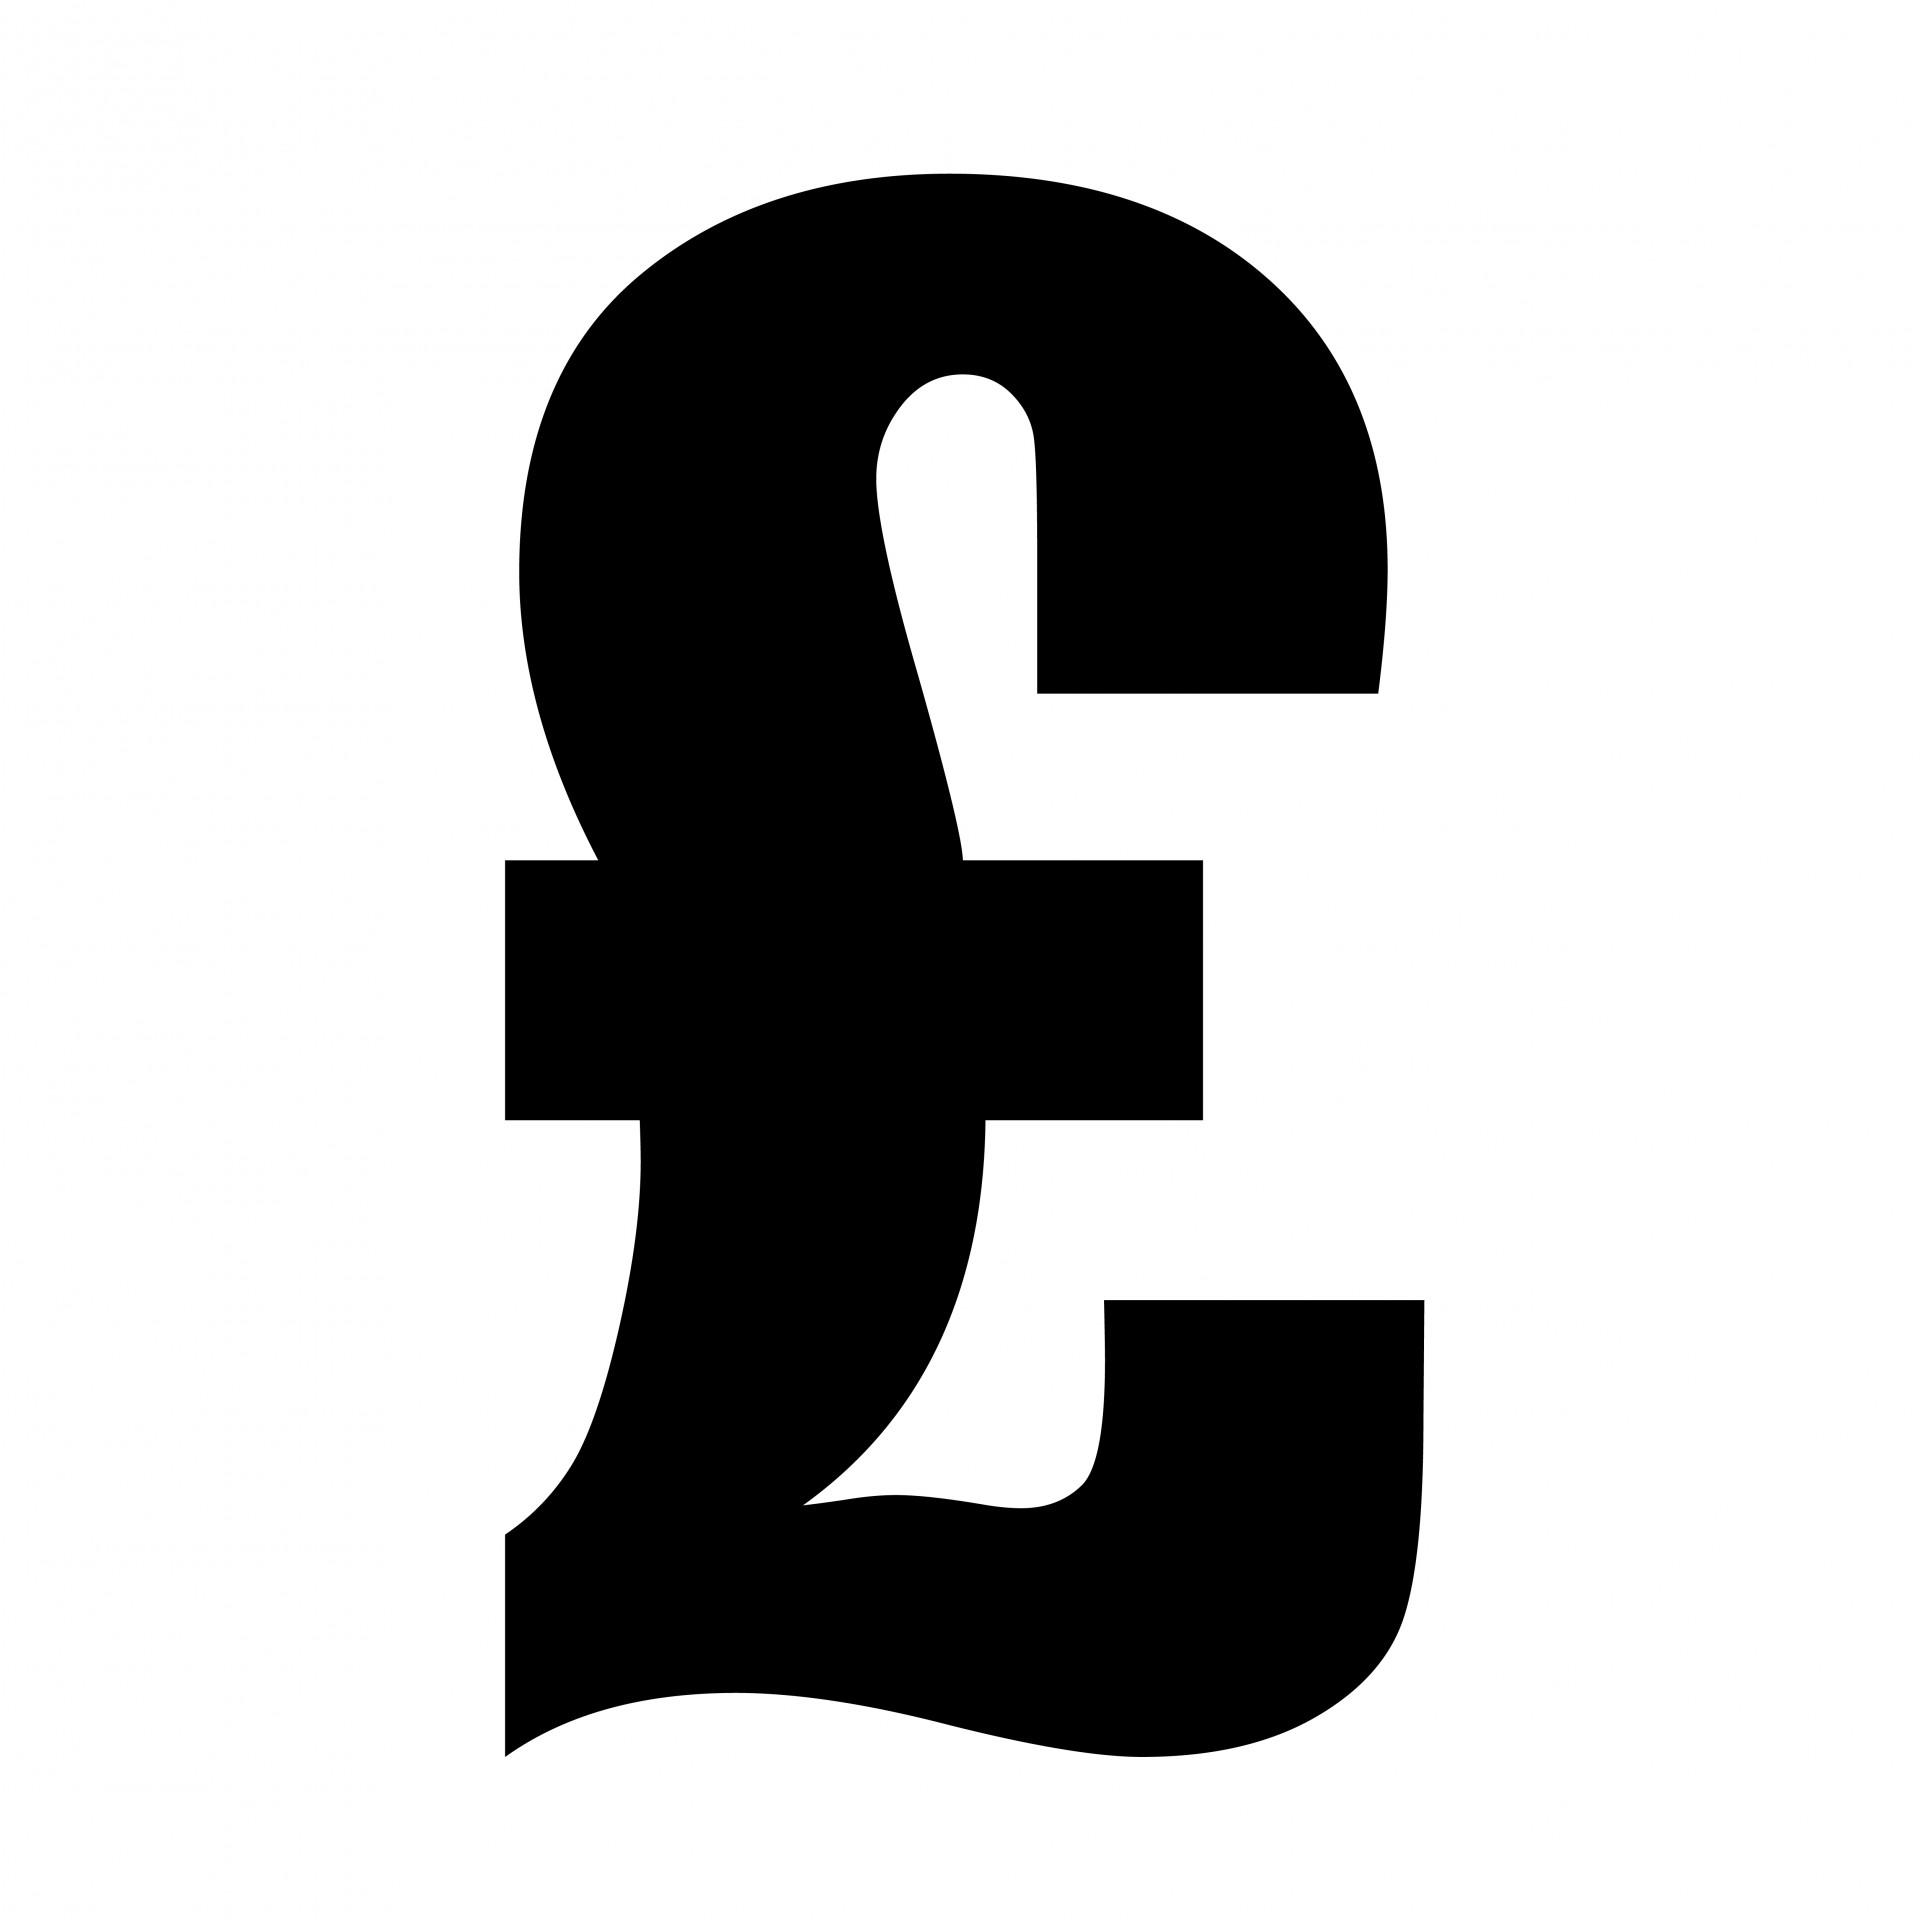 Pound Sign Clip Art.